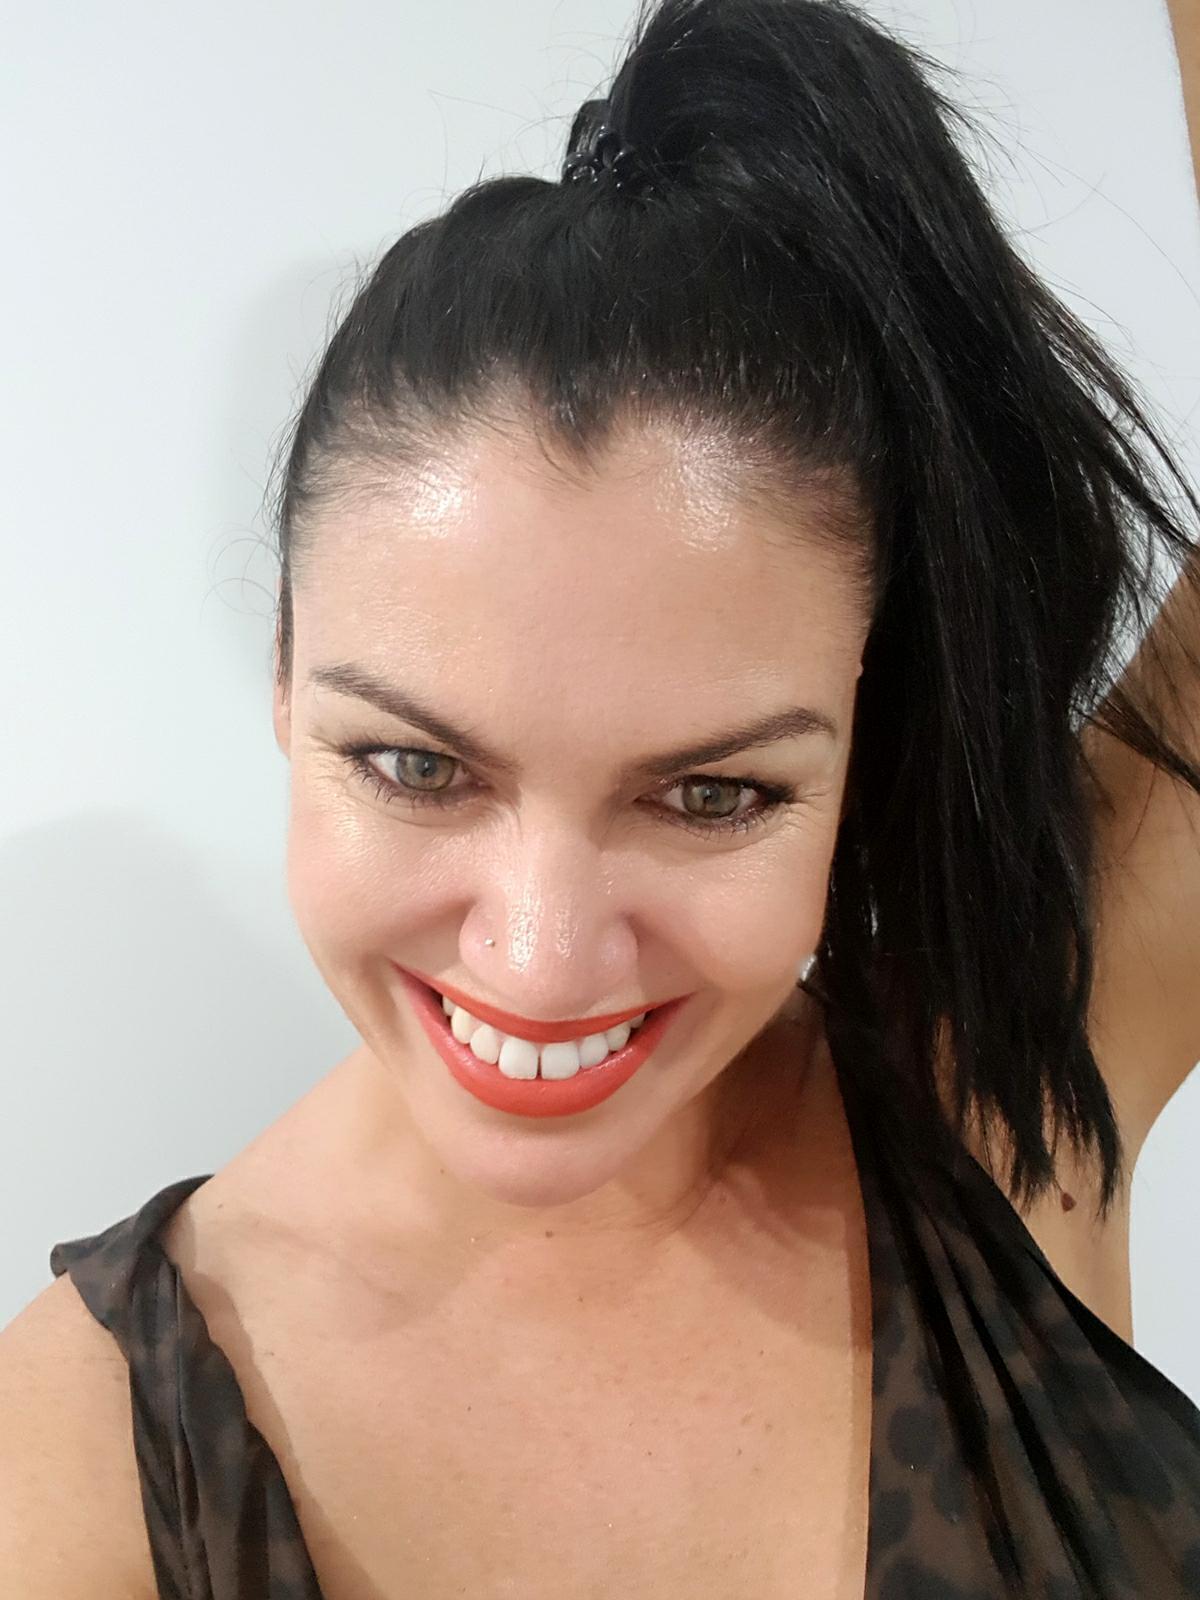 samantha clark smile white teeth arbonne lipstick orange